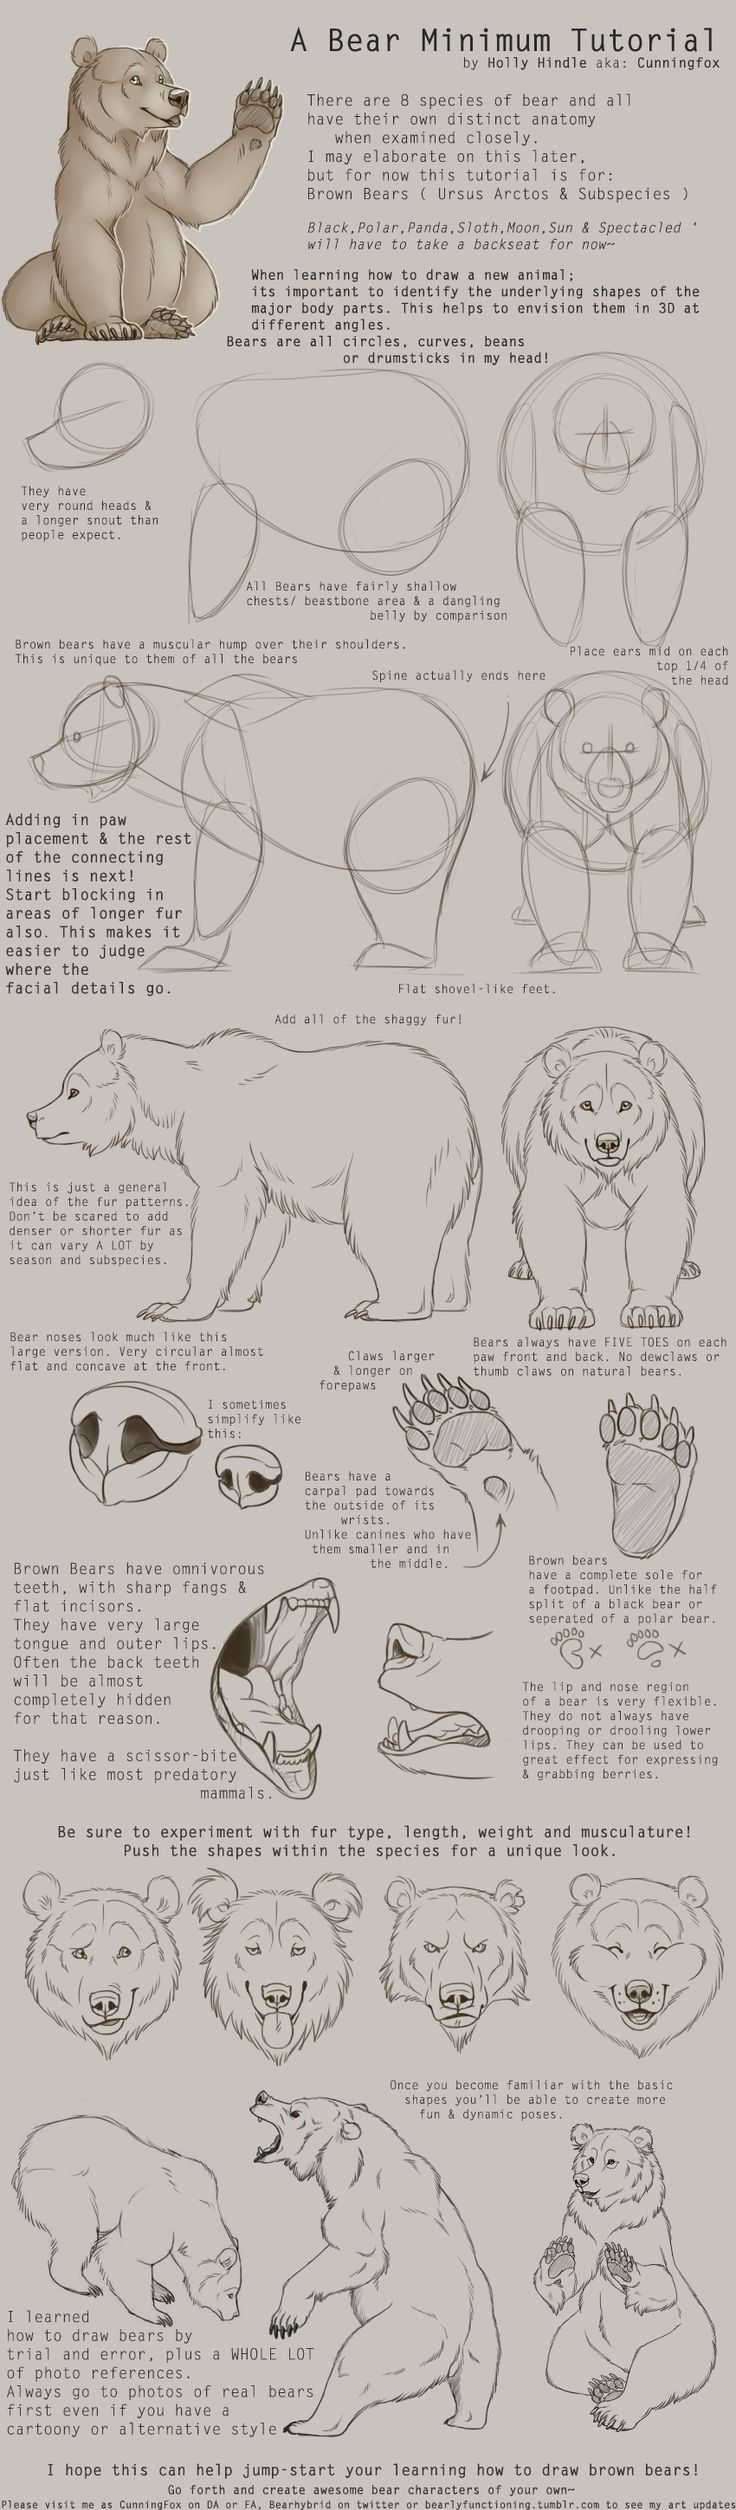 Beautiful Animal Anatomy And Physiology Inspiration - Anatomy and ...